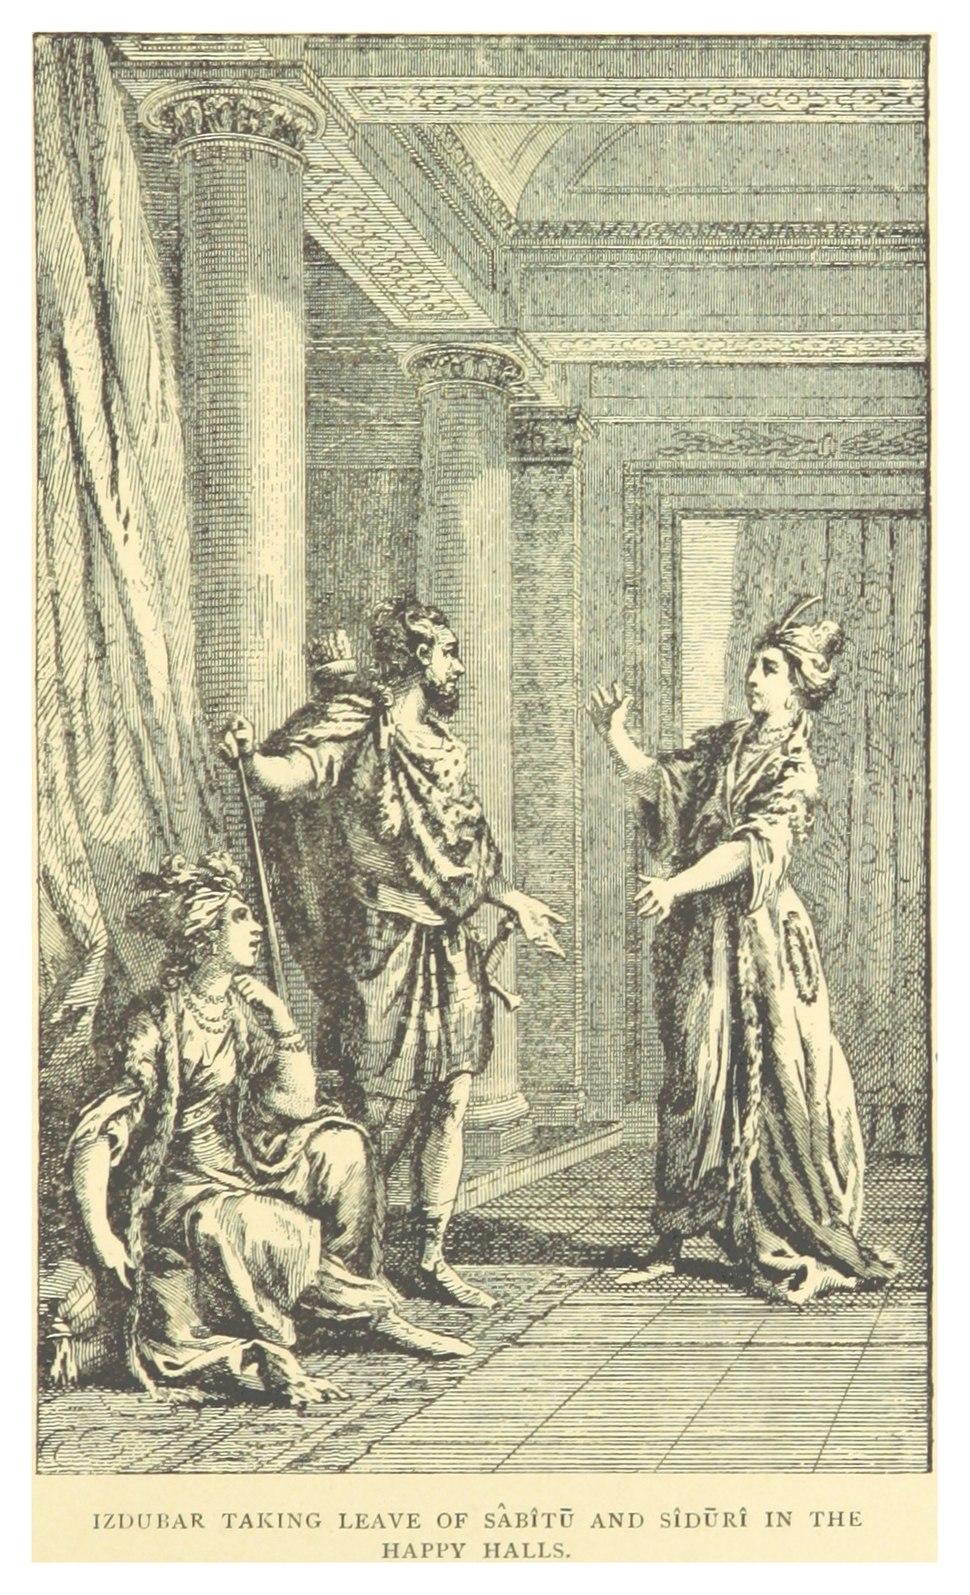 ISHTAR-EPOS p221 IZDUBAR TAKING LEAVE OF SABITU AND SIDURI IN THE HAPPY HALLS